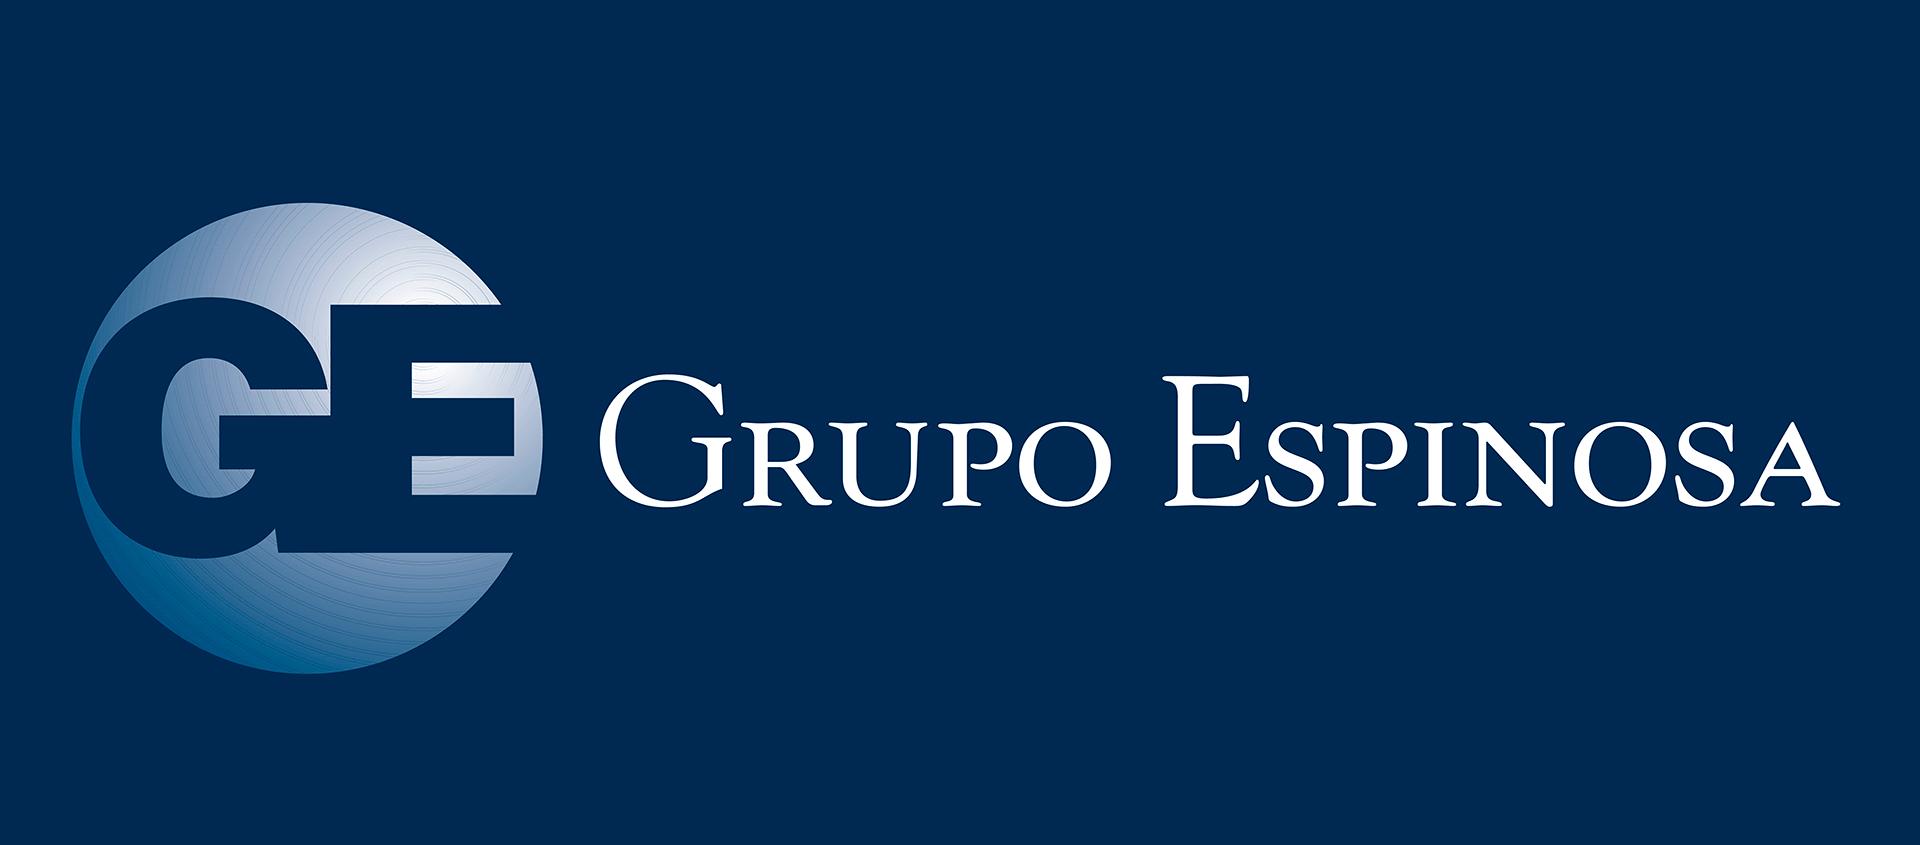 GrupoEspinosaGrande